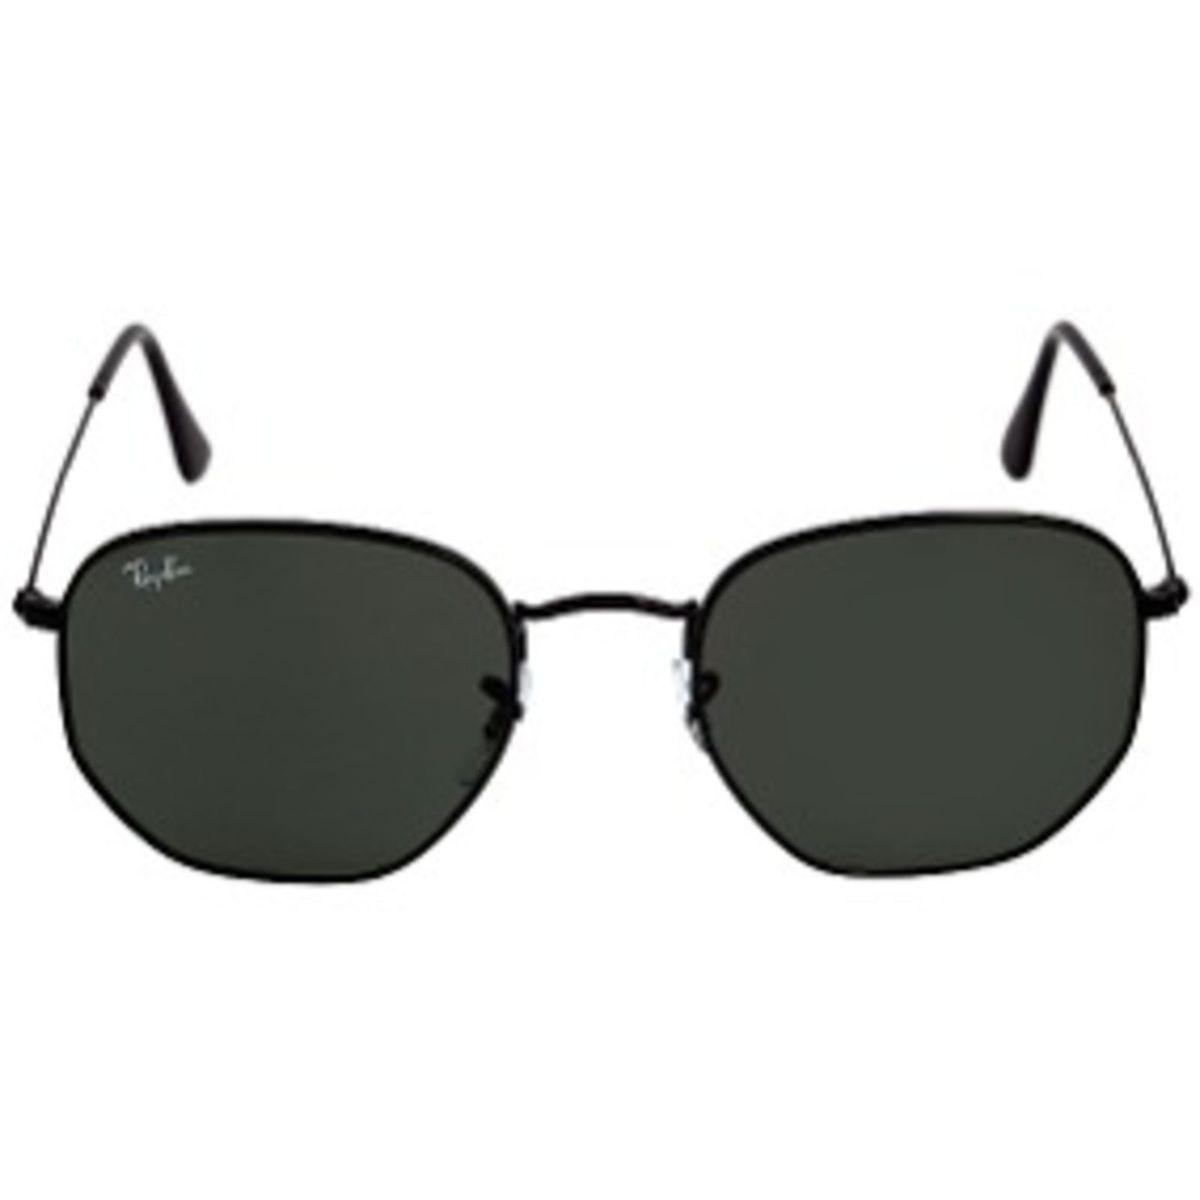 701aed35551f9 Oculos de Sol Ray-ban Hexagonal Preto Quadradinho Feminino Masculino ...